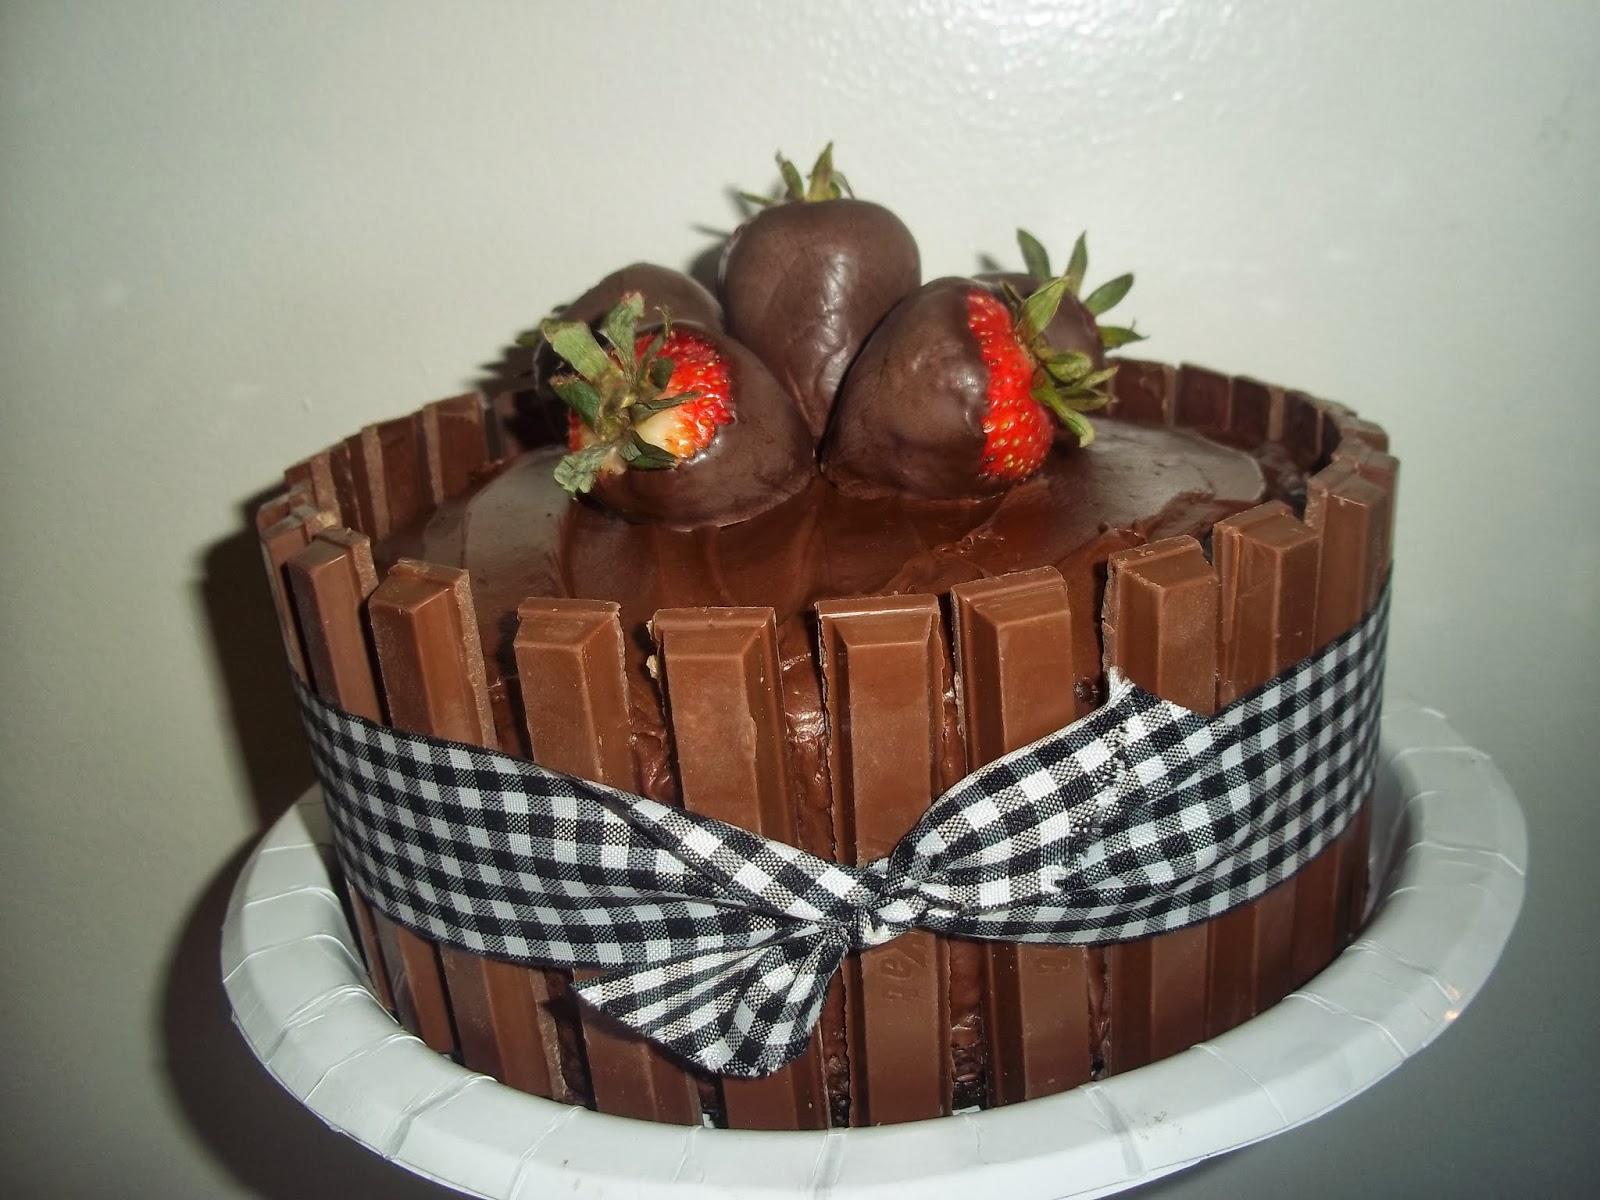 The Daily Smash: Chocolate Dipped Strawberry Kit Kat Cake